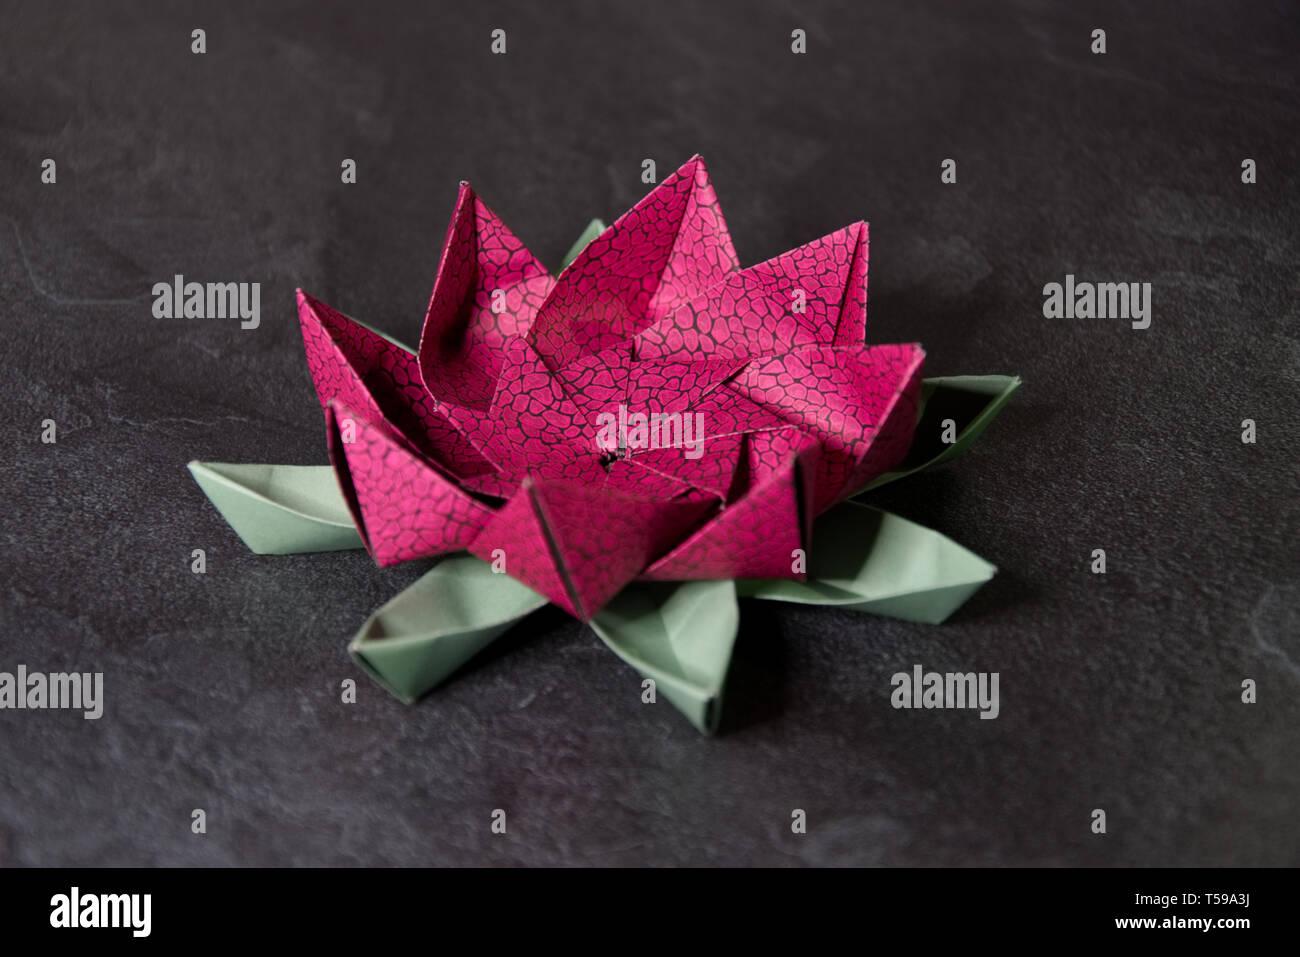 Colors Paper: DIY Paper Flower Tutorial step by step - Beautiful ... | 957x1300